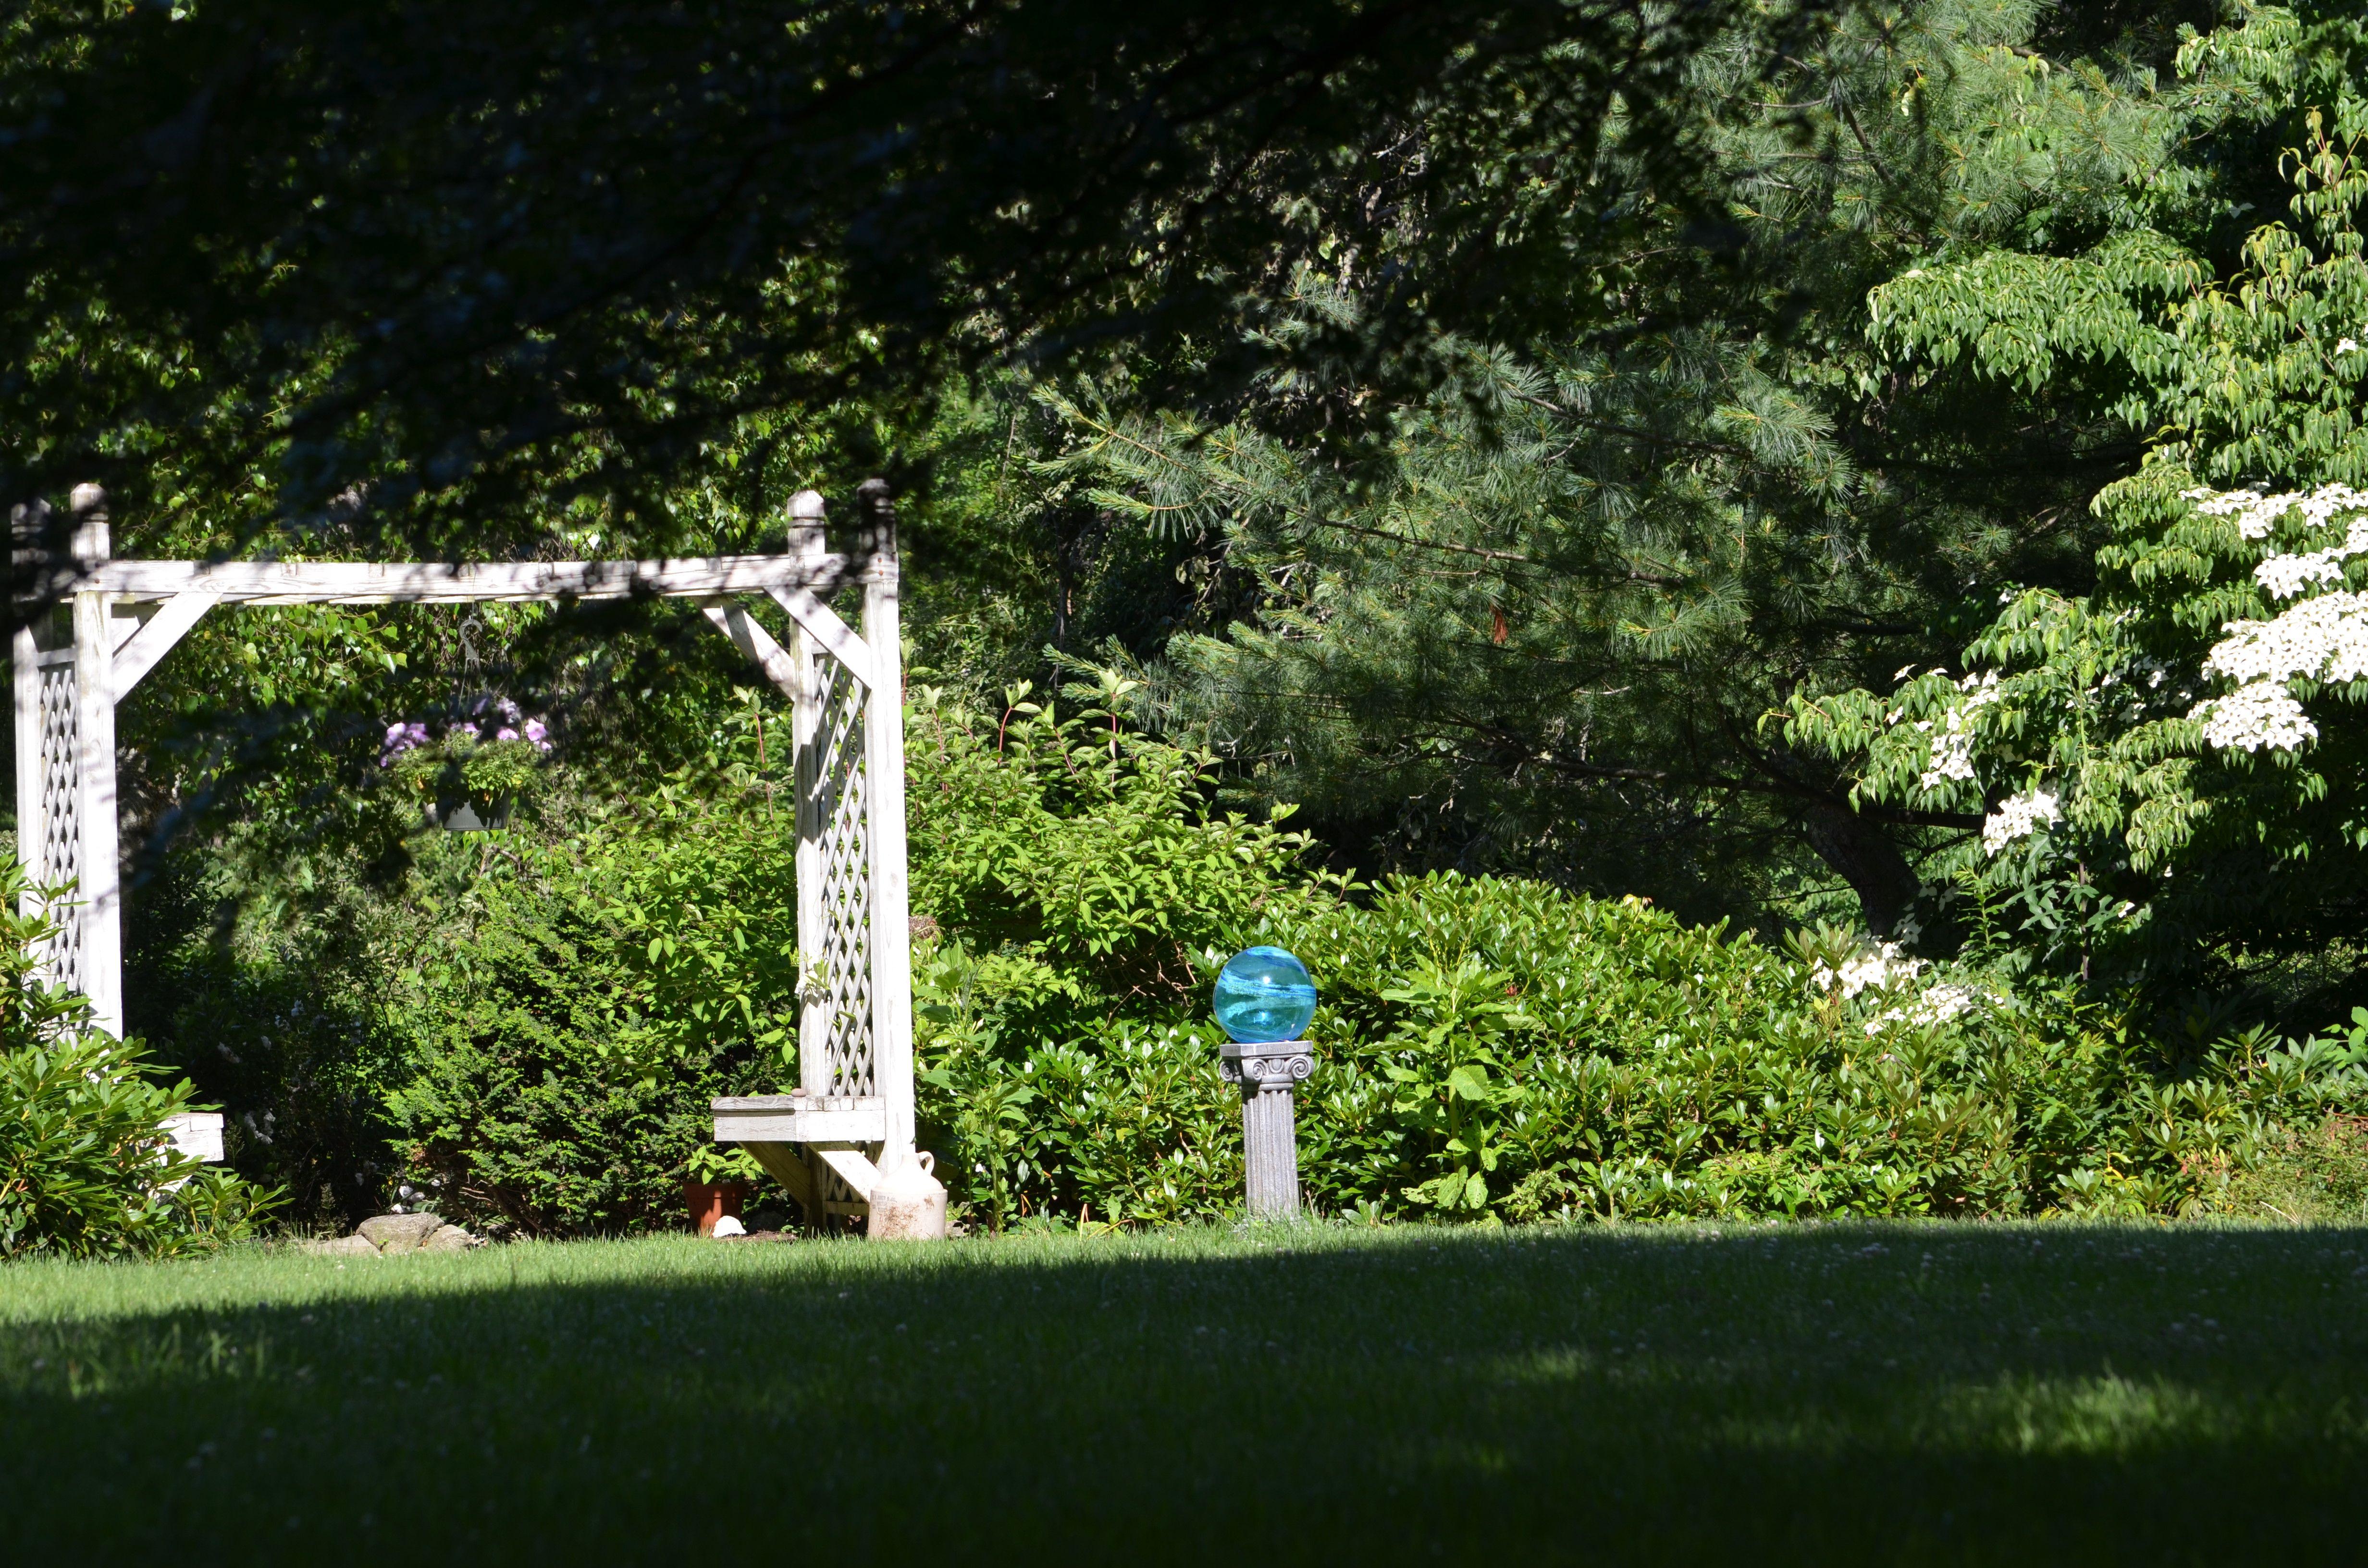 Entry to the White Garden 2012